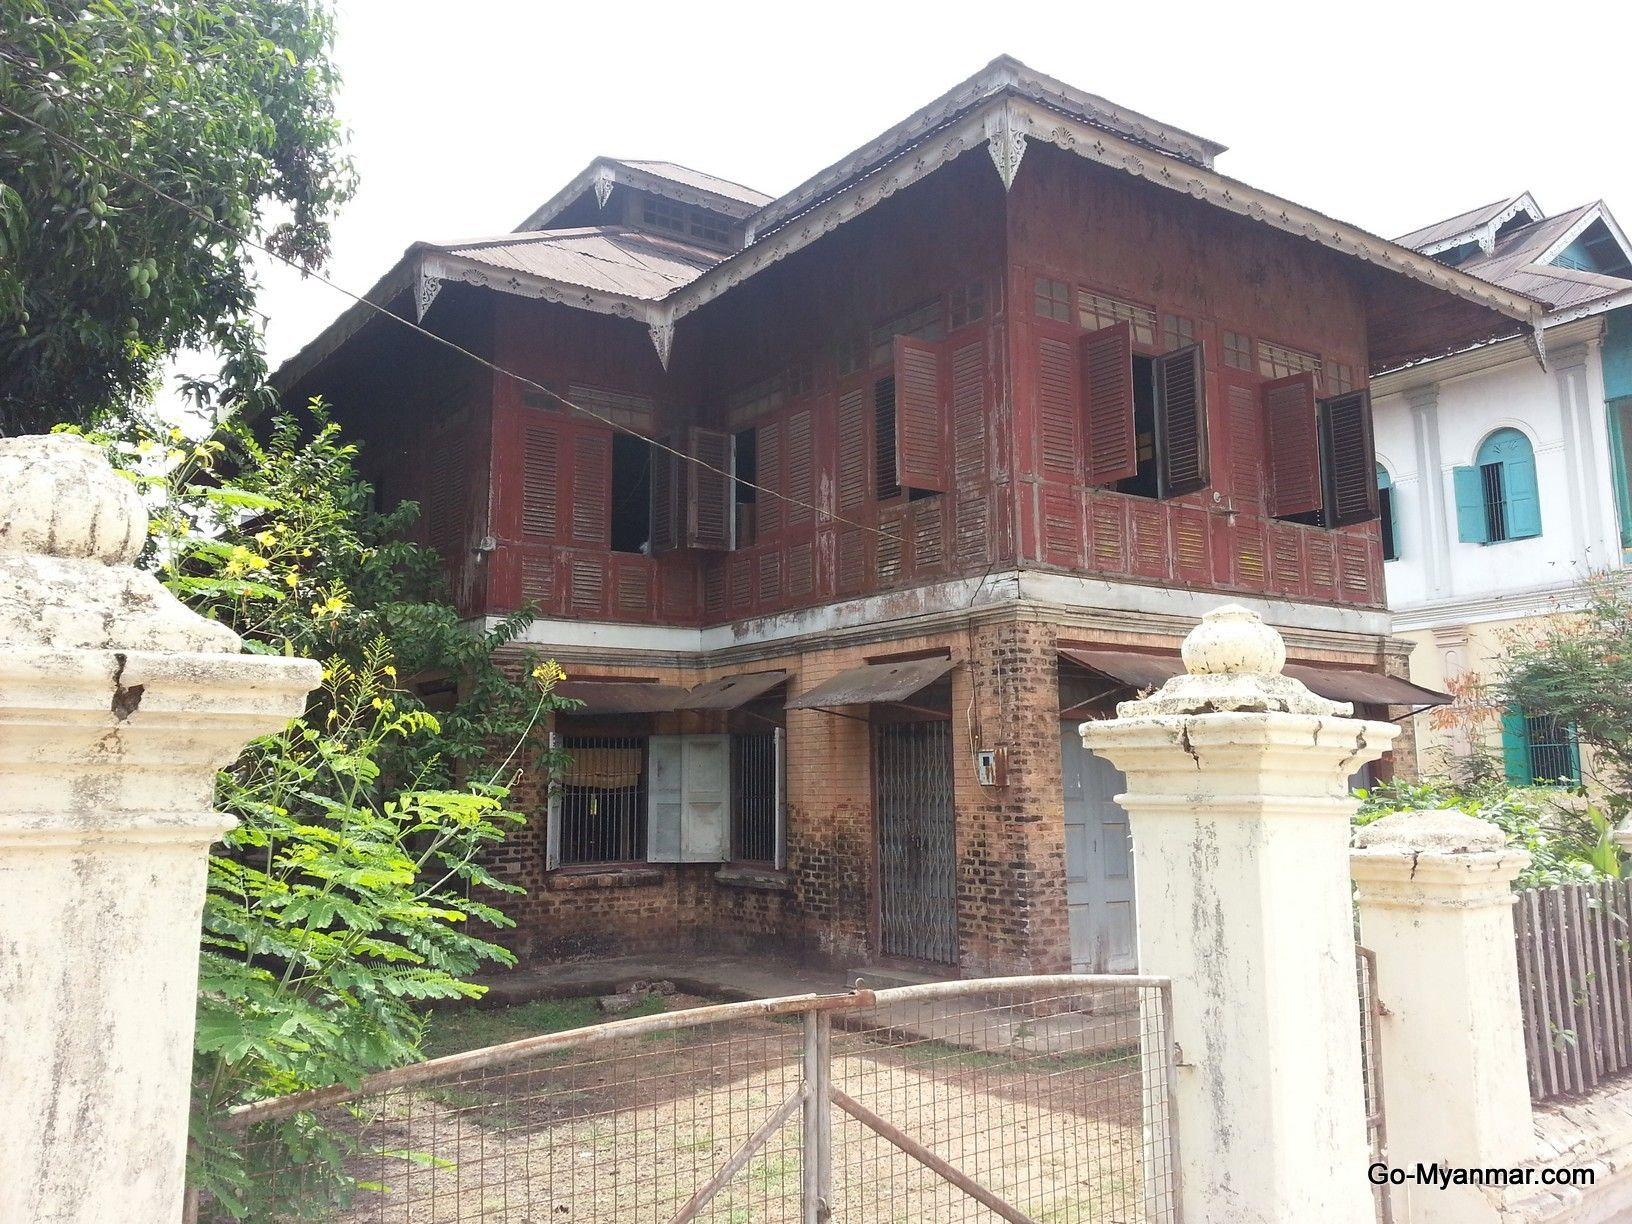 colonial era house in dawei myanmar burma go here for